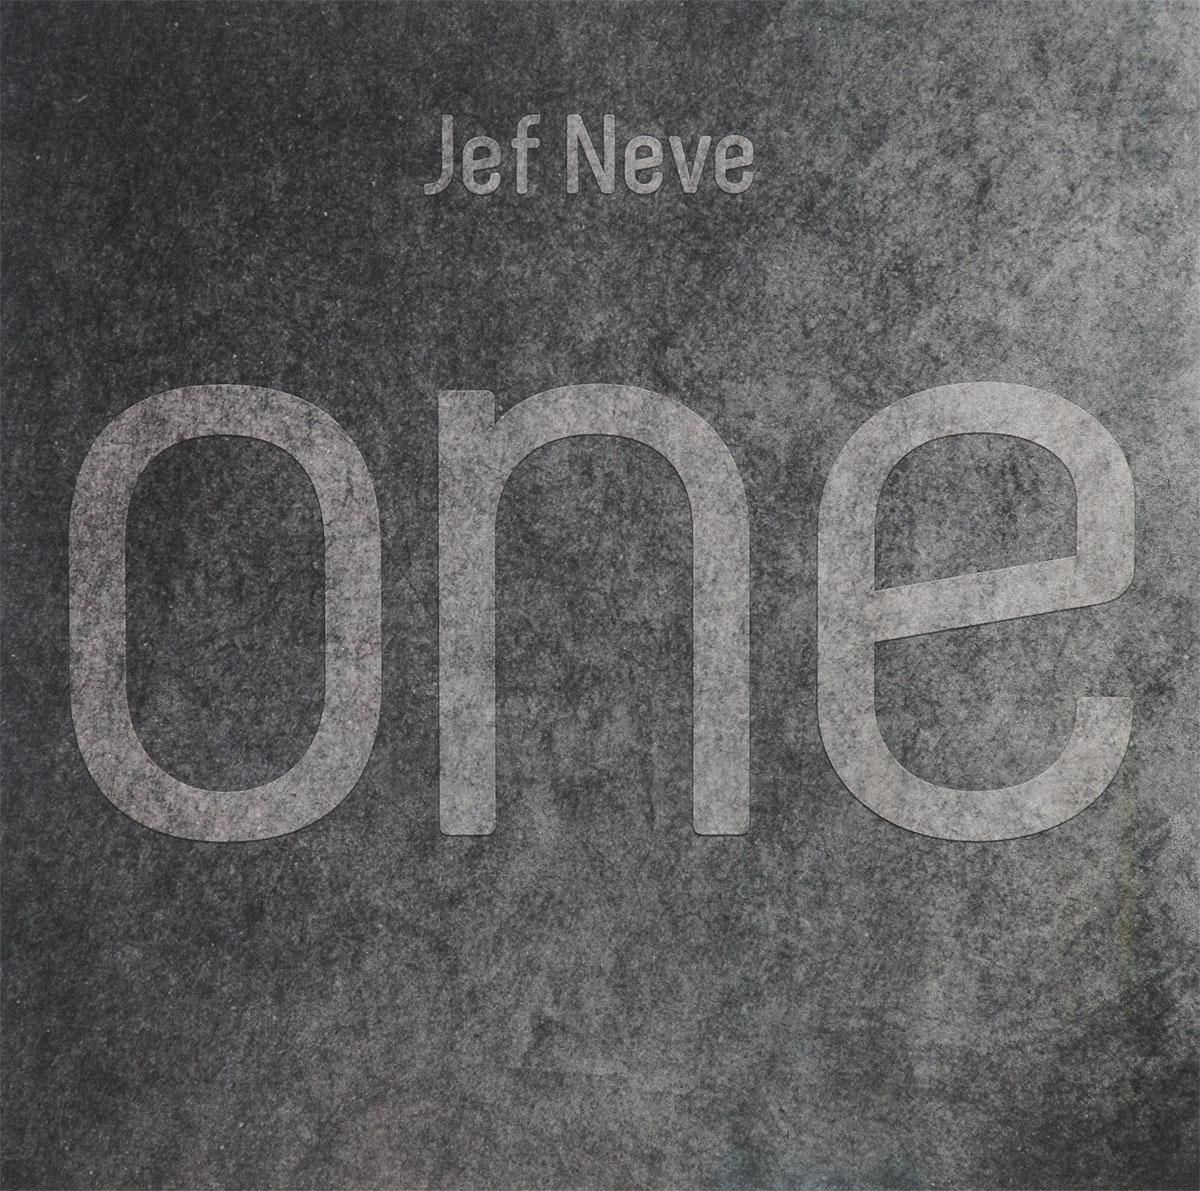 Джеф Неве Jef Neve. One (LP)